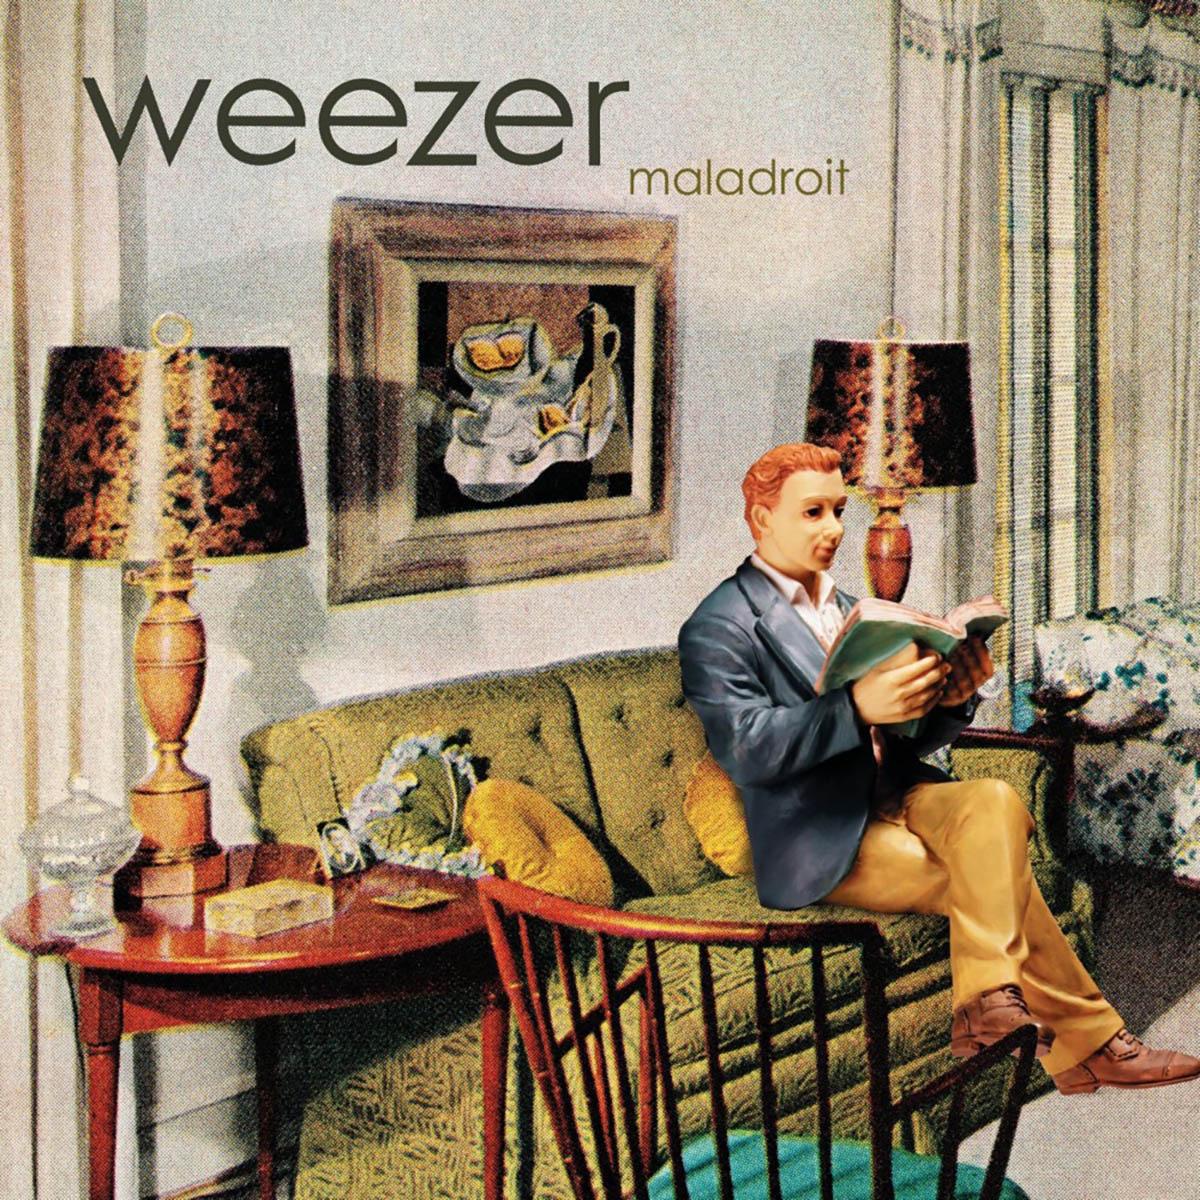 Weezer, Maladroit